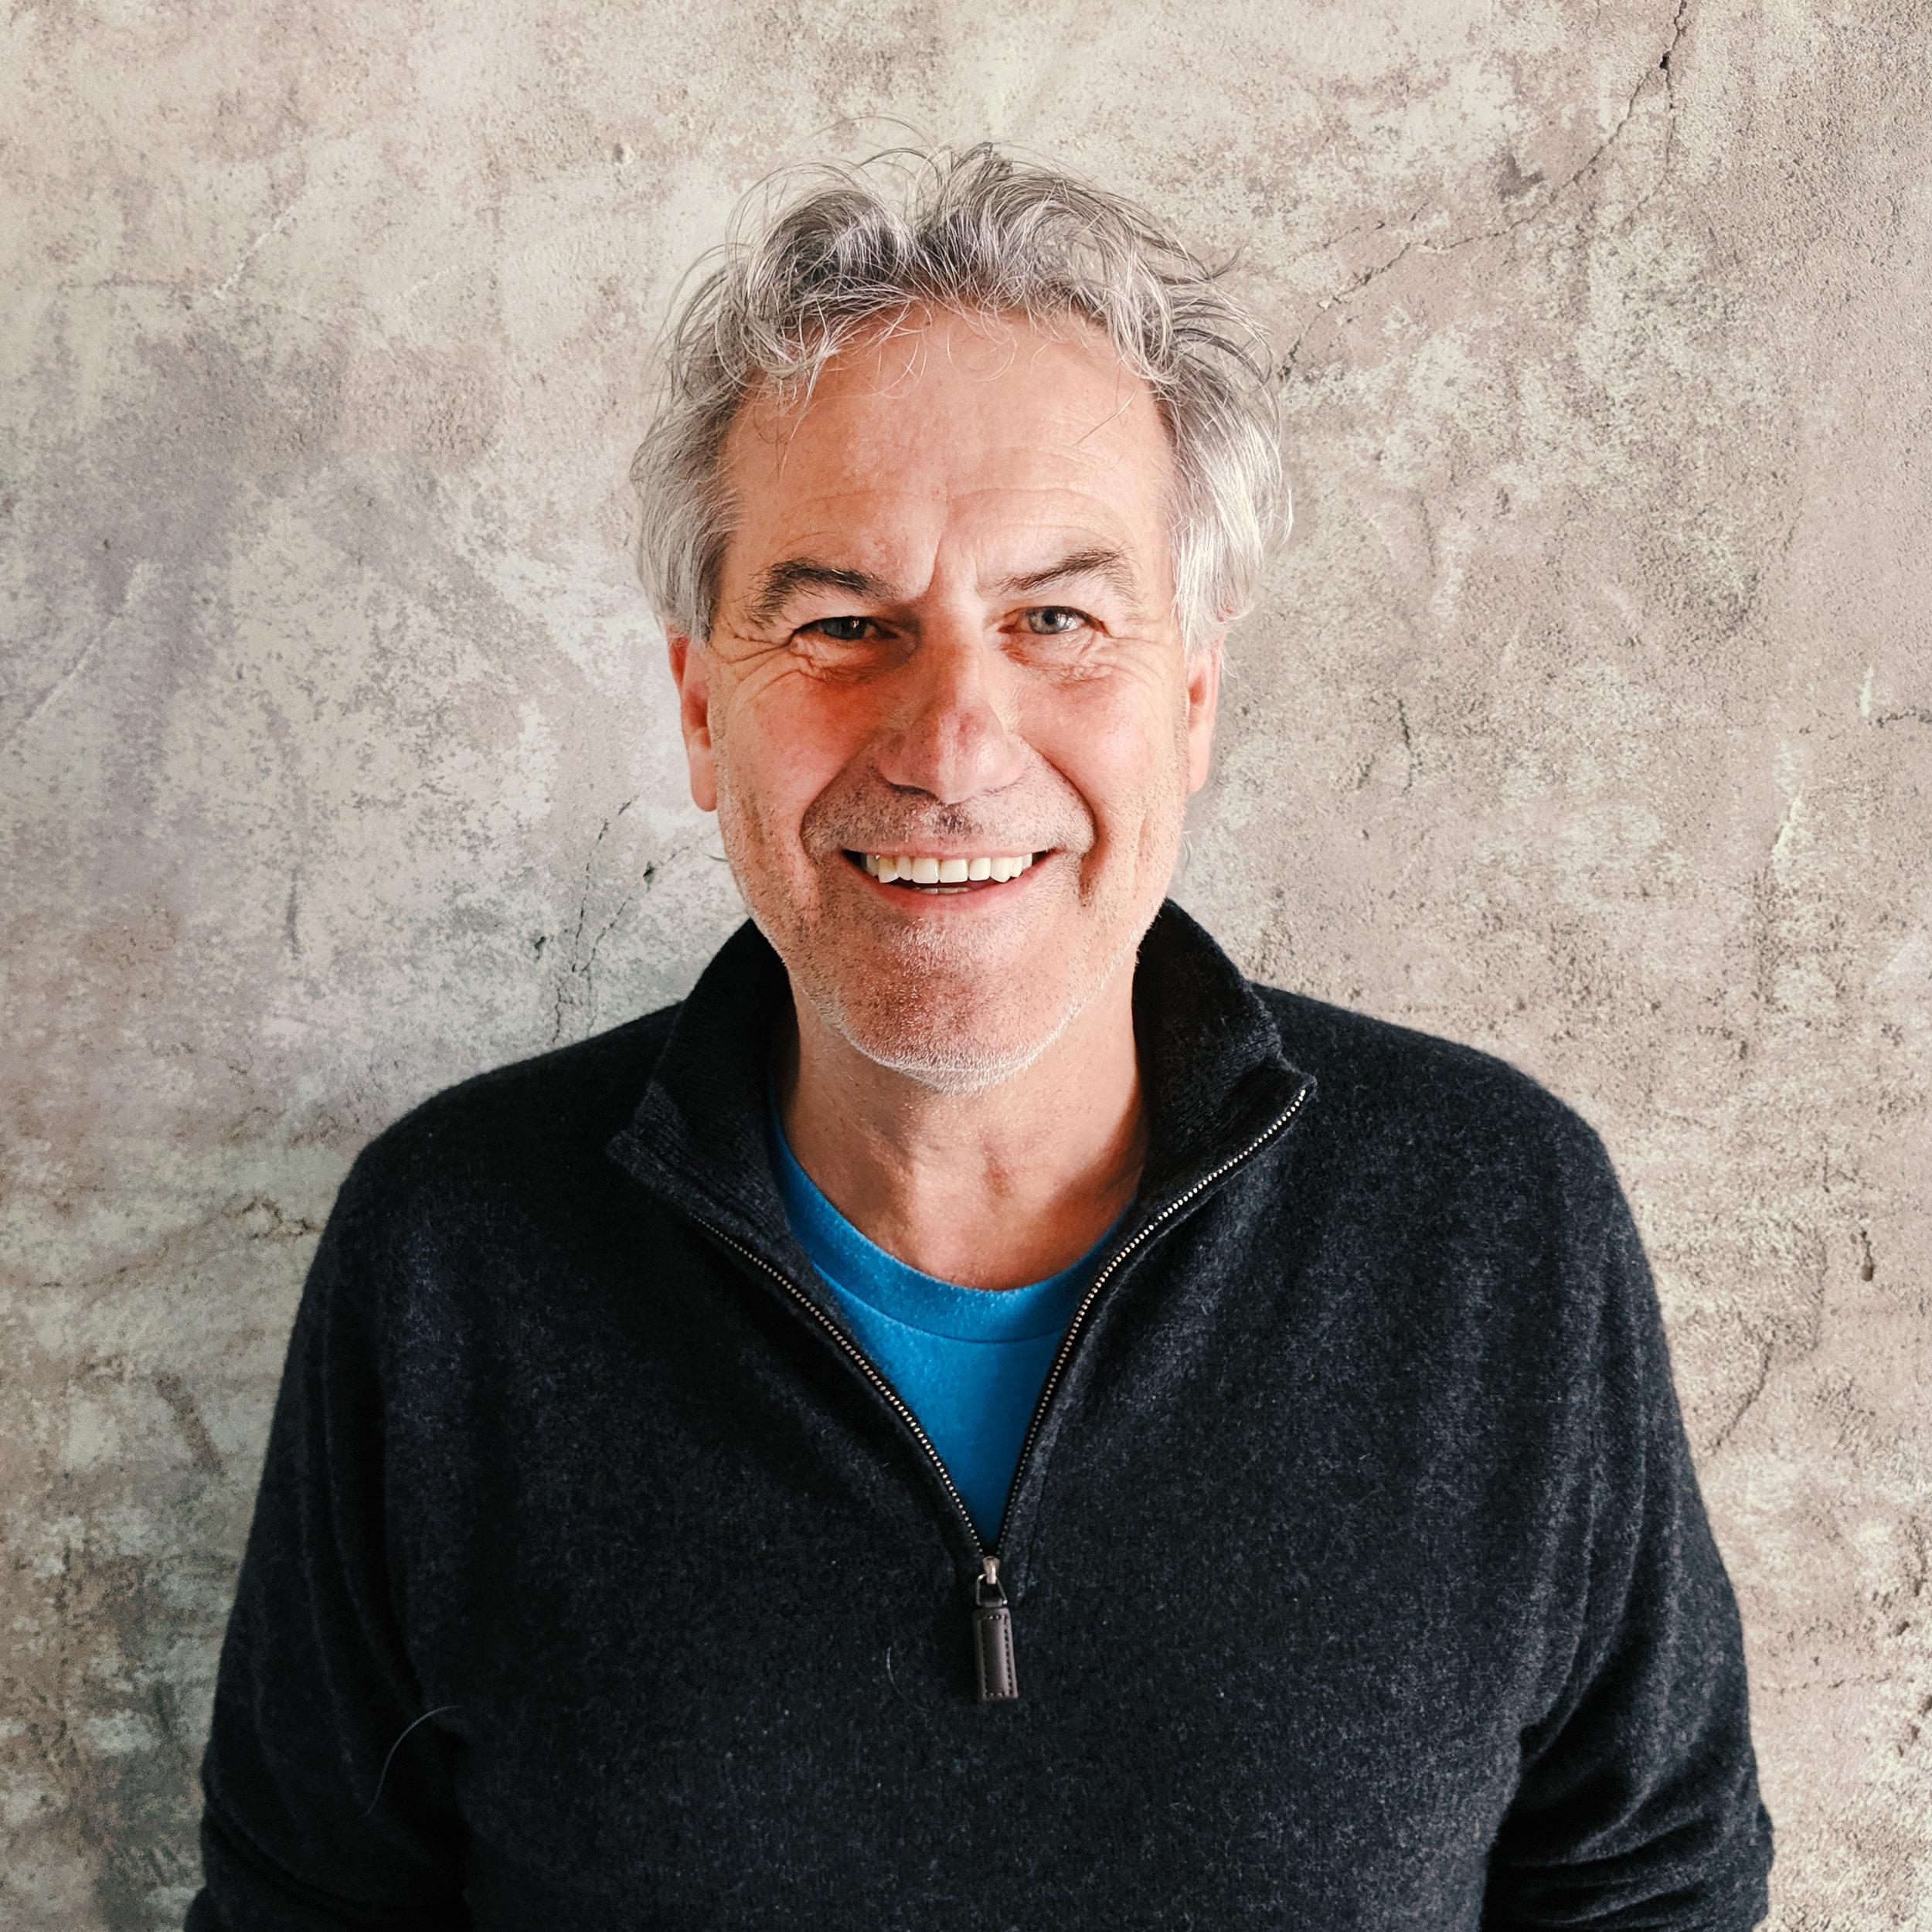 Kieran Folliard, Founder